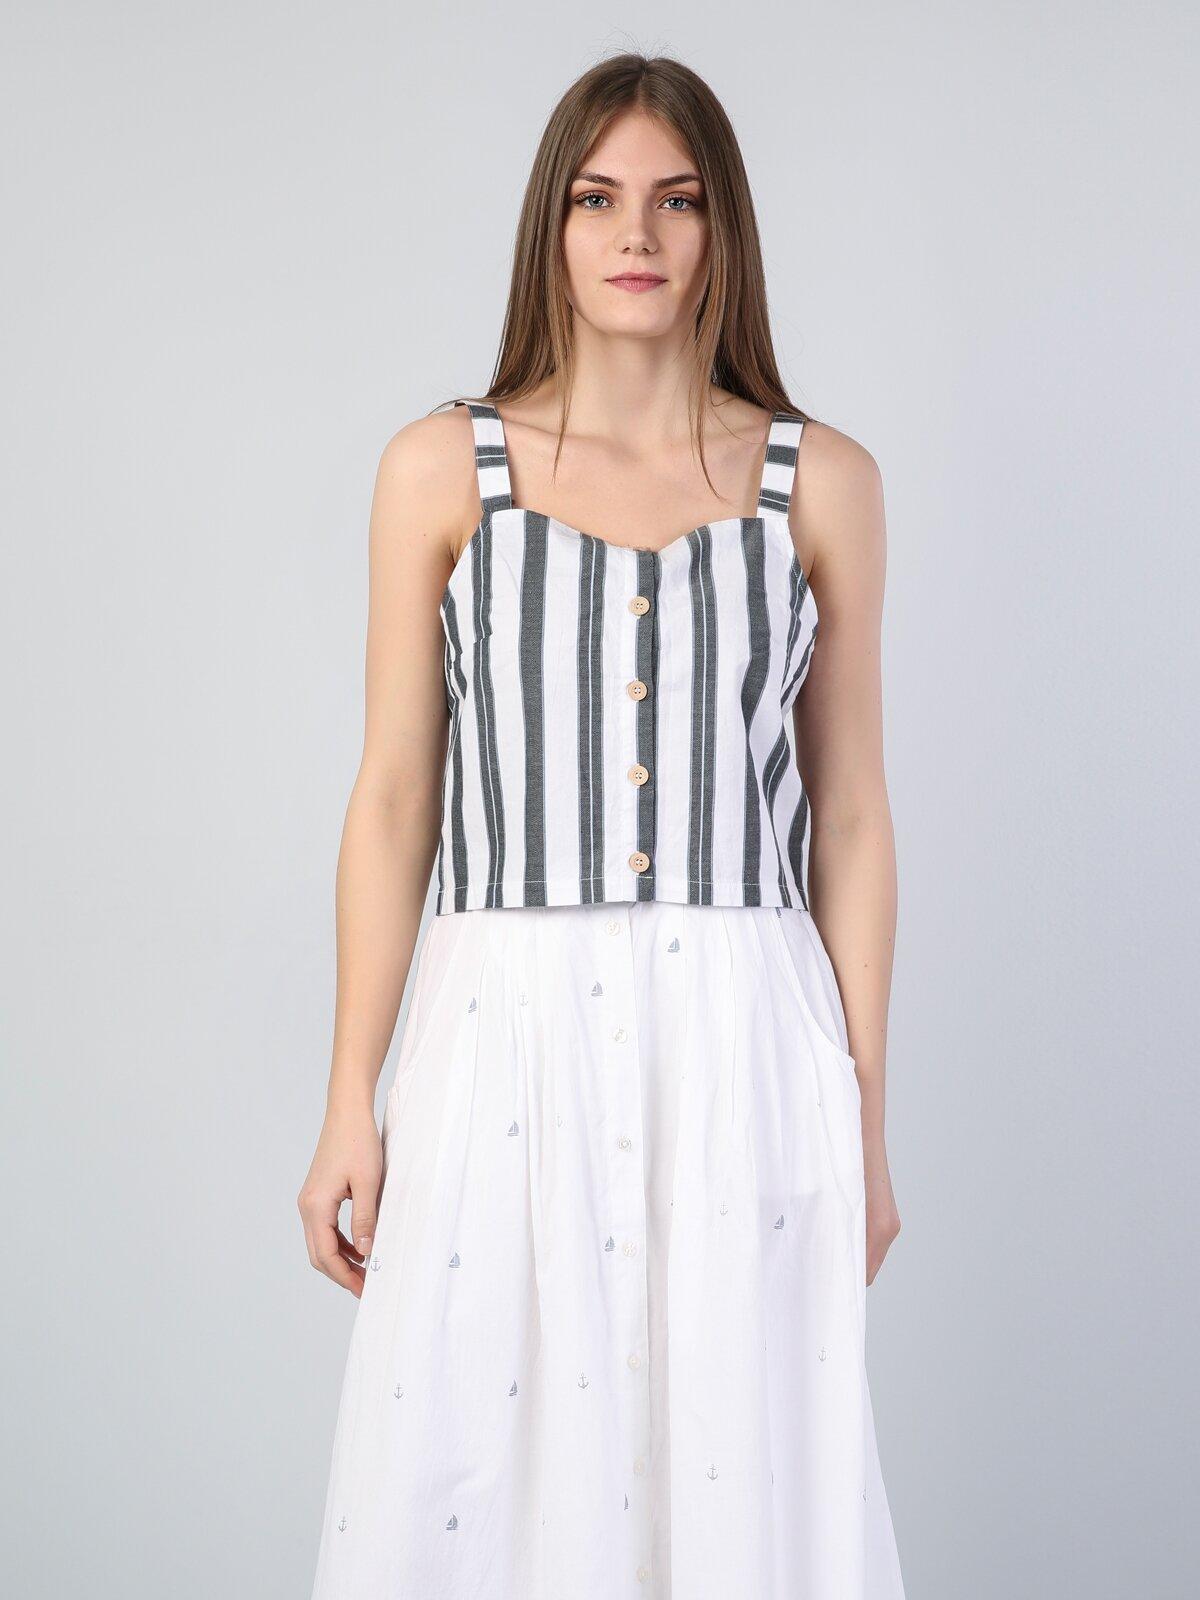 Slim Fit Kare Kadın İndigo Kısa Kol Gömlek